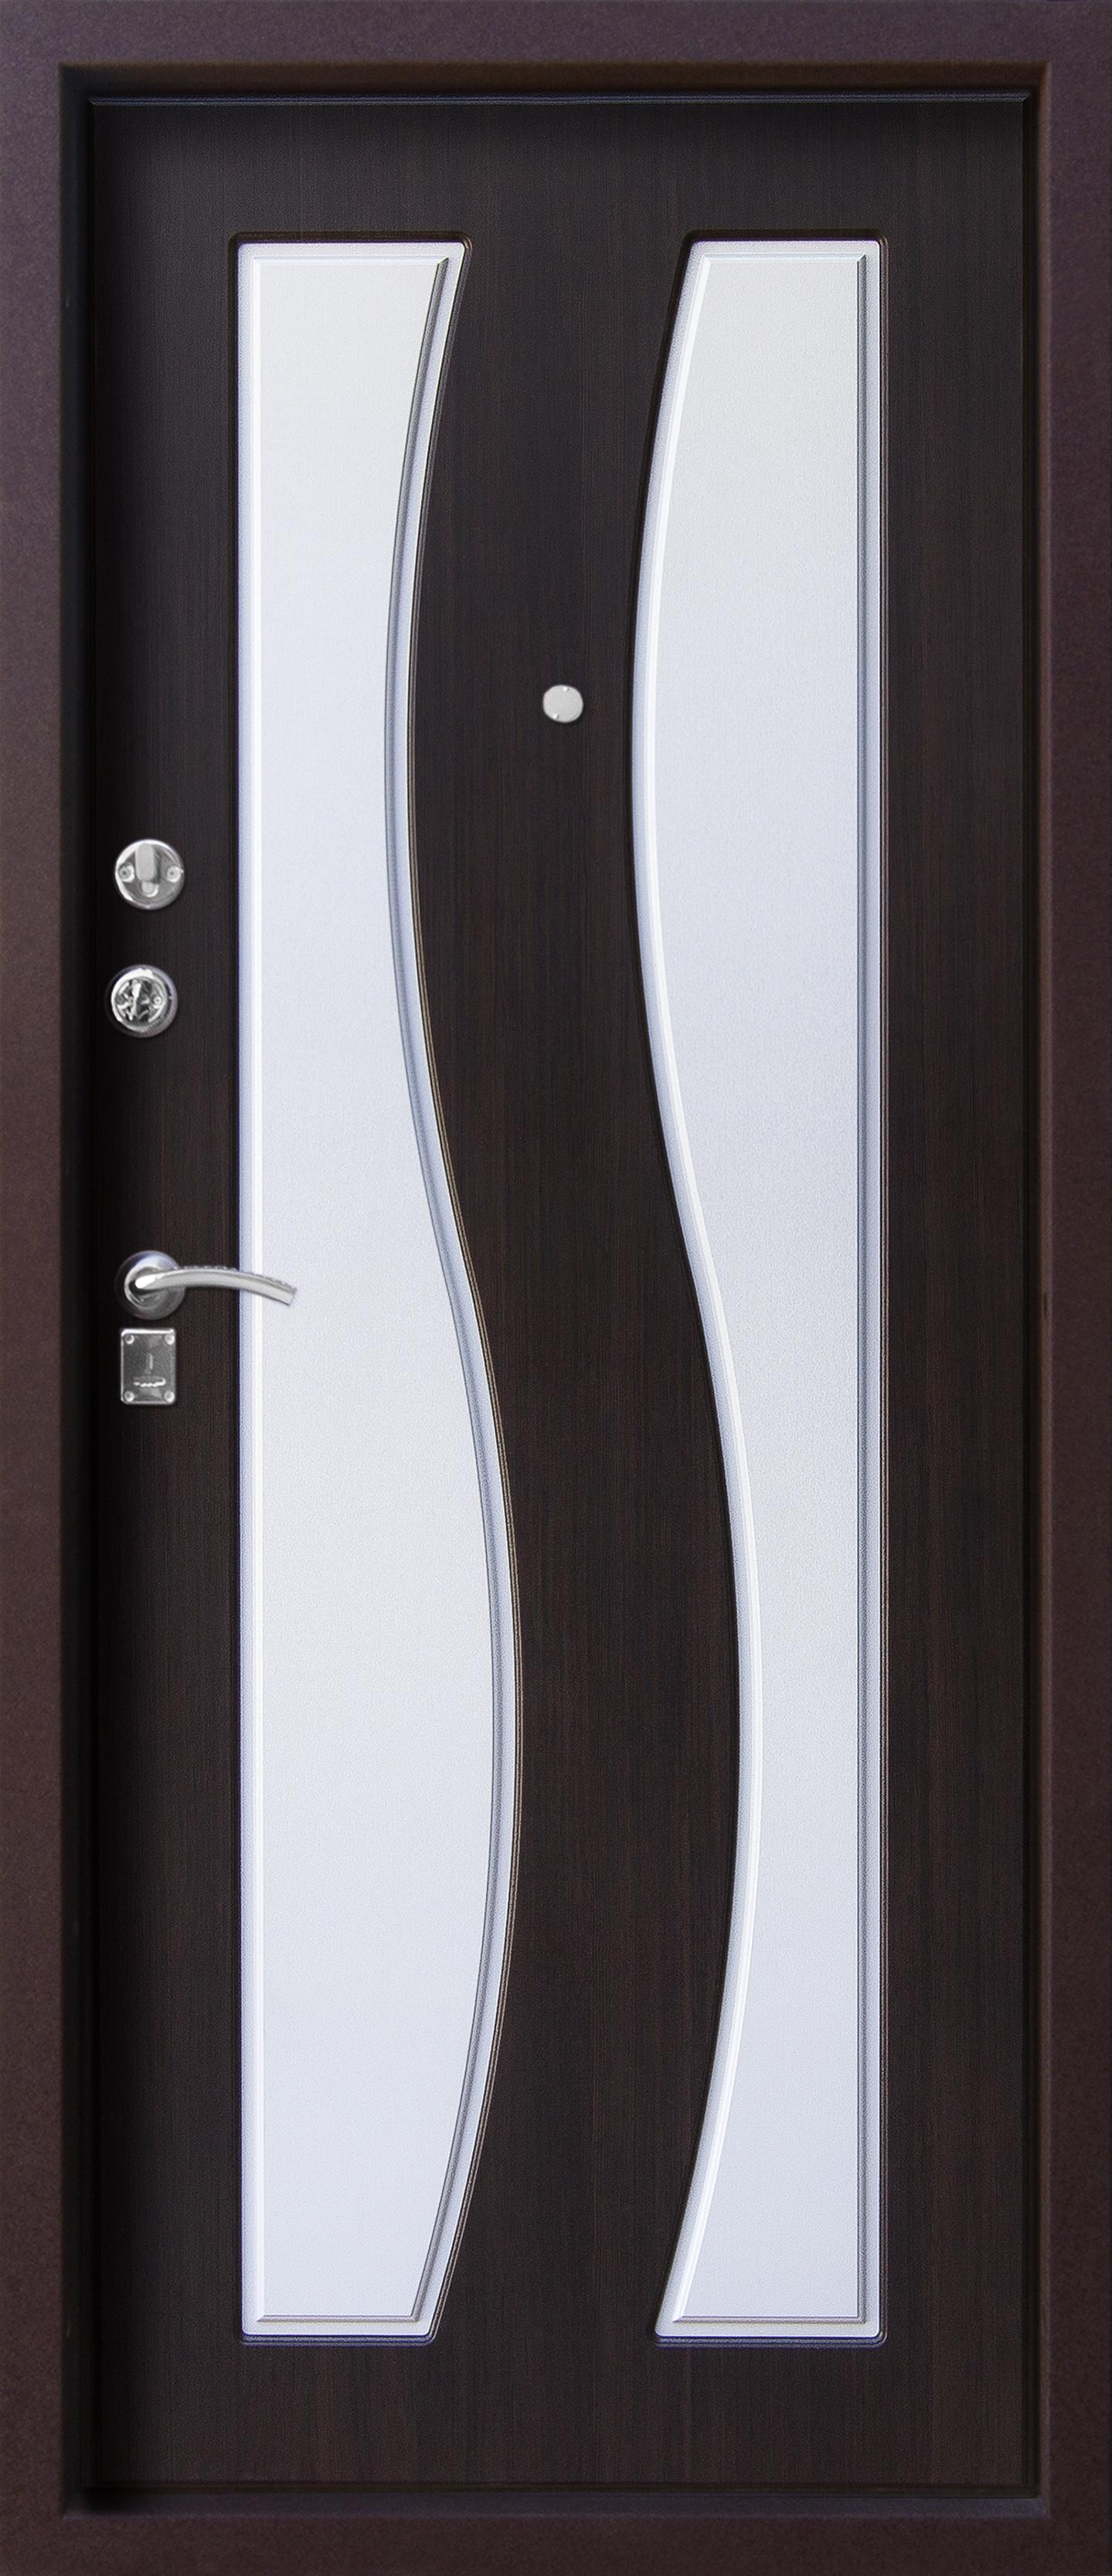 Цвет: Венге - Белый шелк